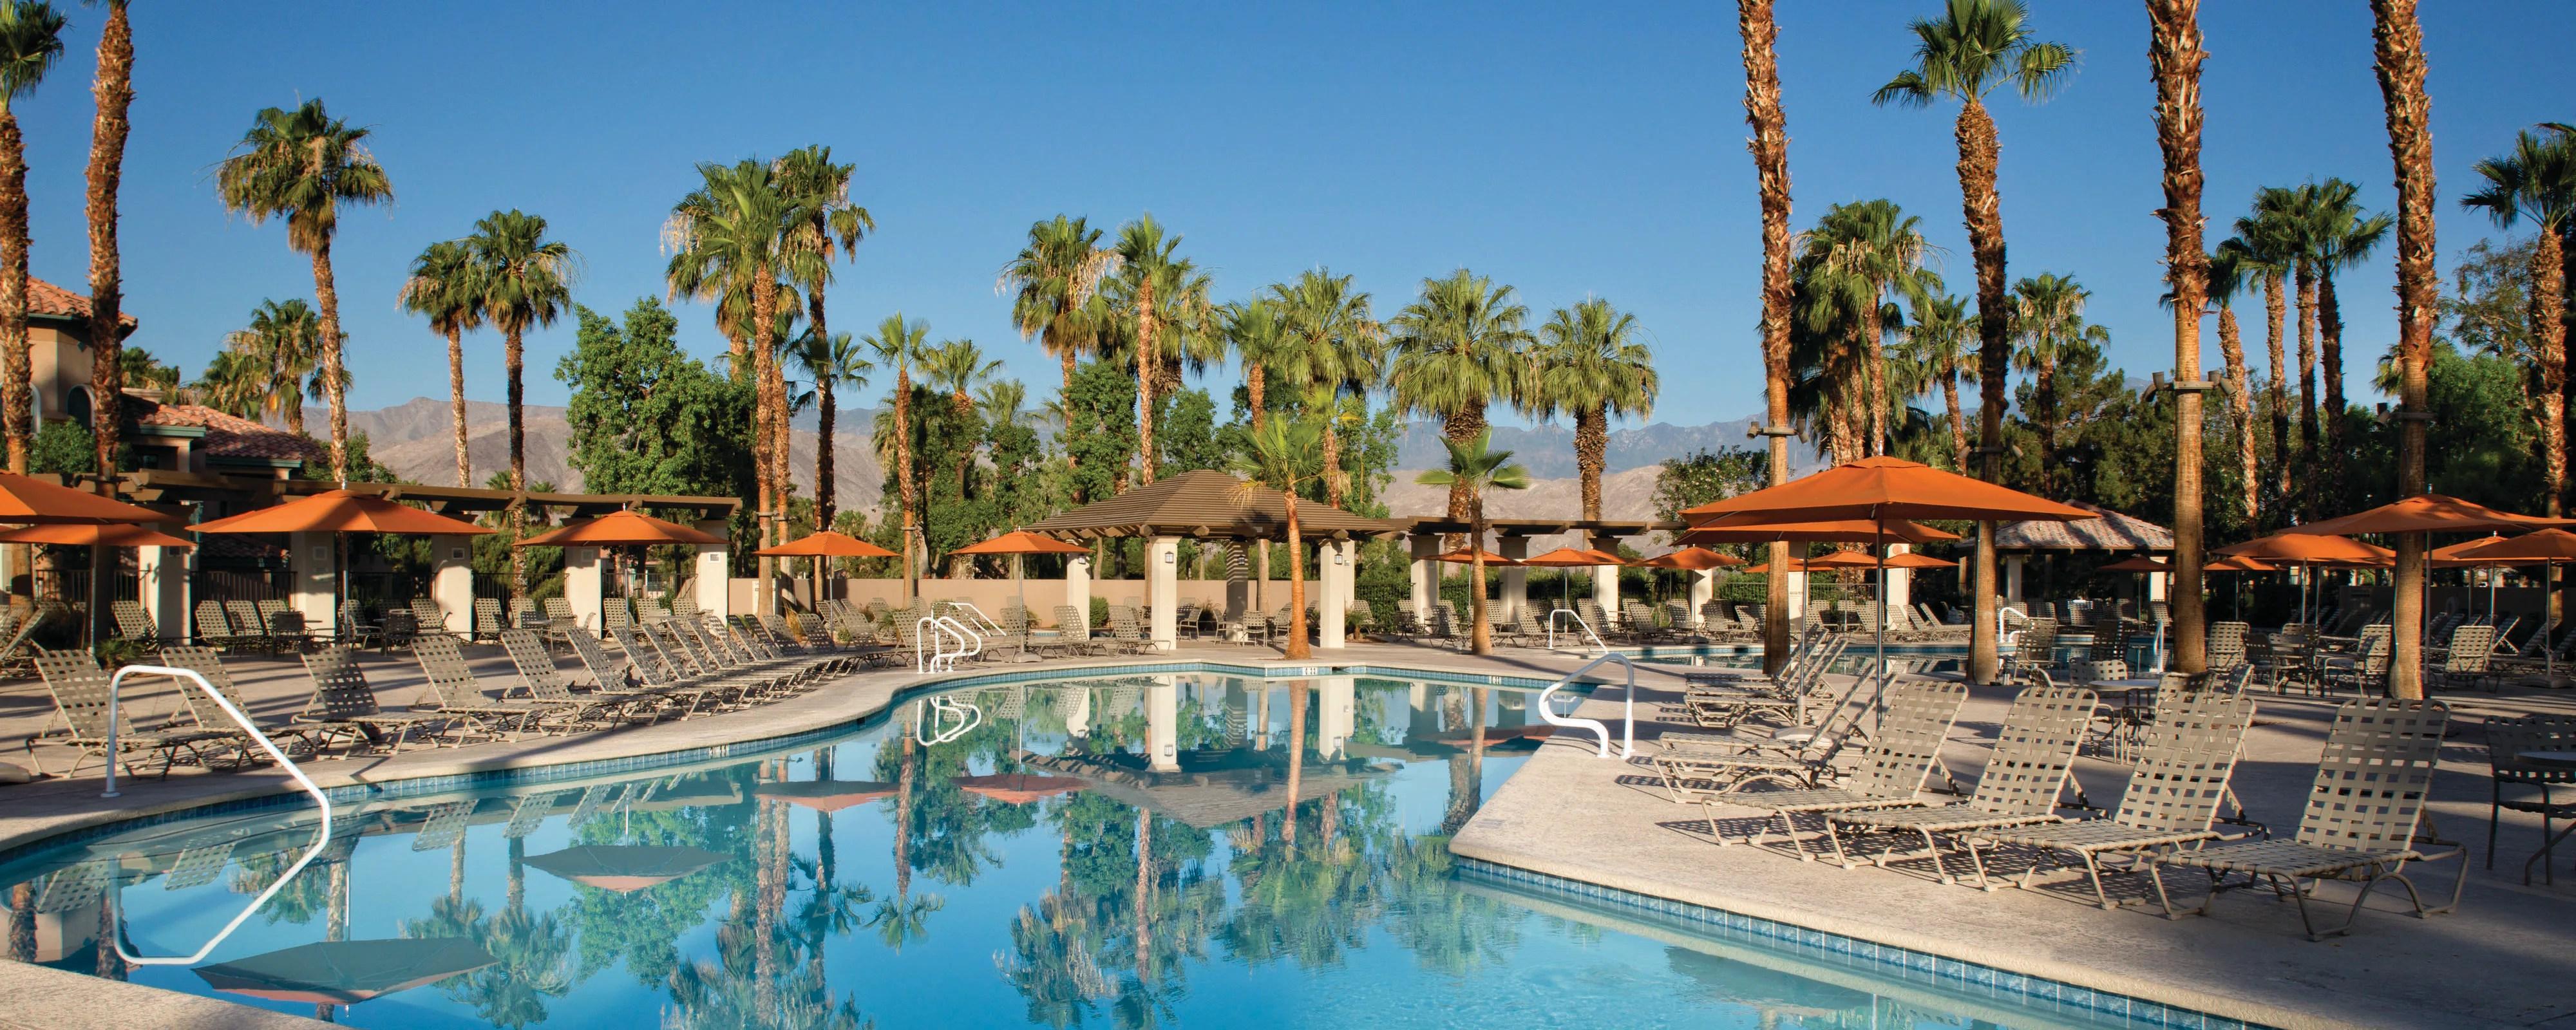 Villas de Palm Desert Villa de Palm Desert  Villas del